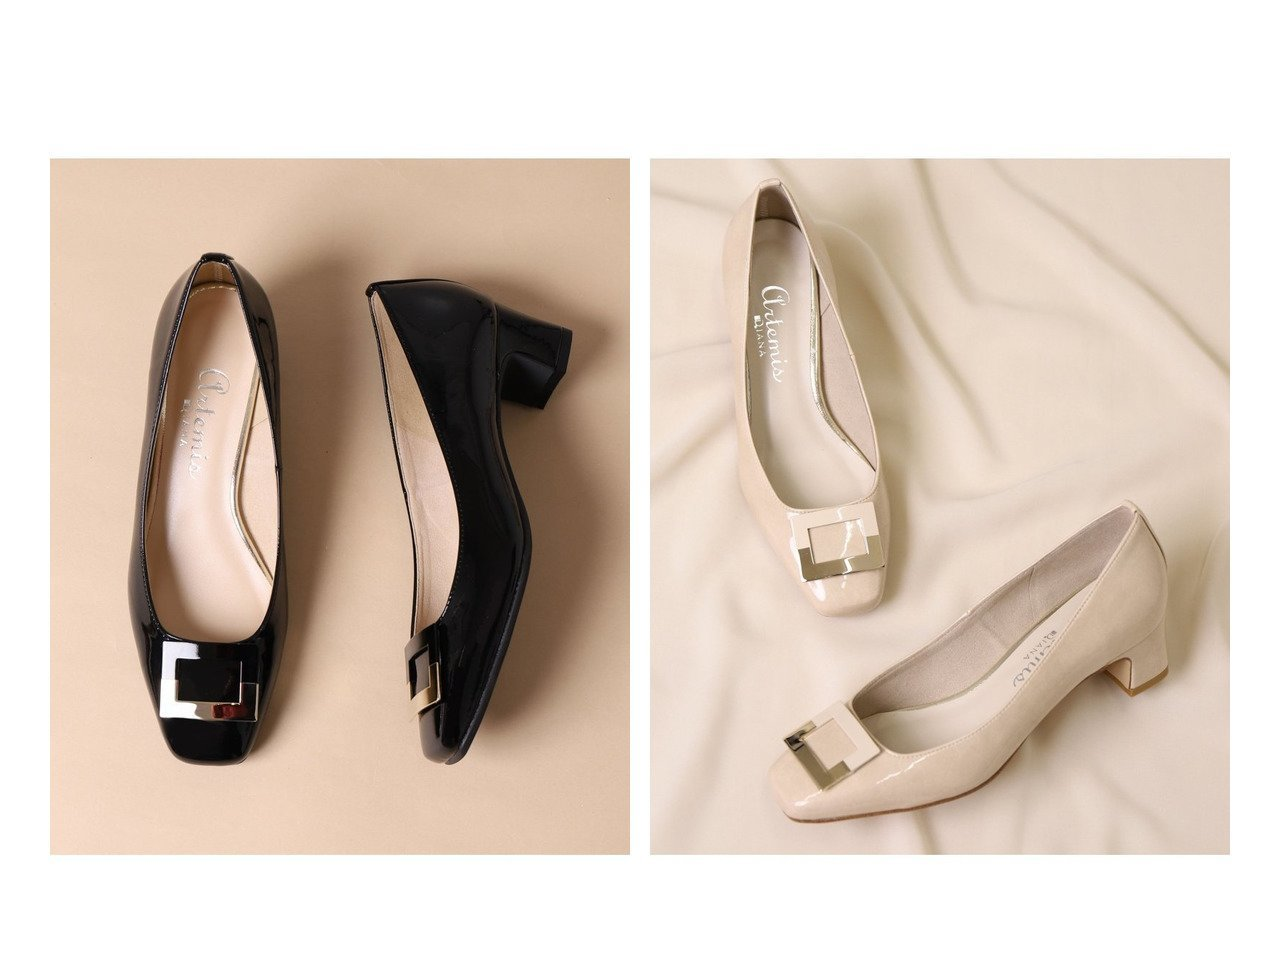 【artemis by DIANA/アルテミス バイ ダイアナ】のバックル付きスクエアトゥパンプス シューズ・靴のおすすめ!人気、トレンド・レディースファッションの通販 おすすめで人気の流行・トレンド、ファッションの通販商品 メンズファッション・キッズファッション・インテリア・家具・レディースファッション・服の通販 founy(ファニー) https://founy.com/ ファッション Fashion レディースファッション WOMEN バッグ Bag シューズ トレンド フィット フォーマル モチーフ 人気 定番 Standard |ID:crp329100000023911